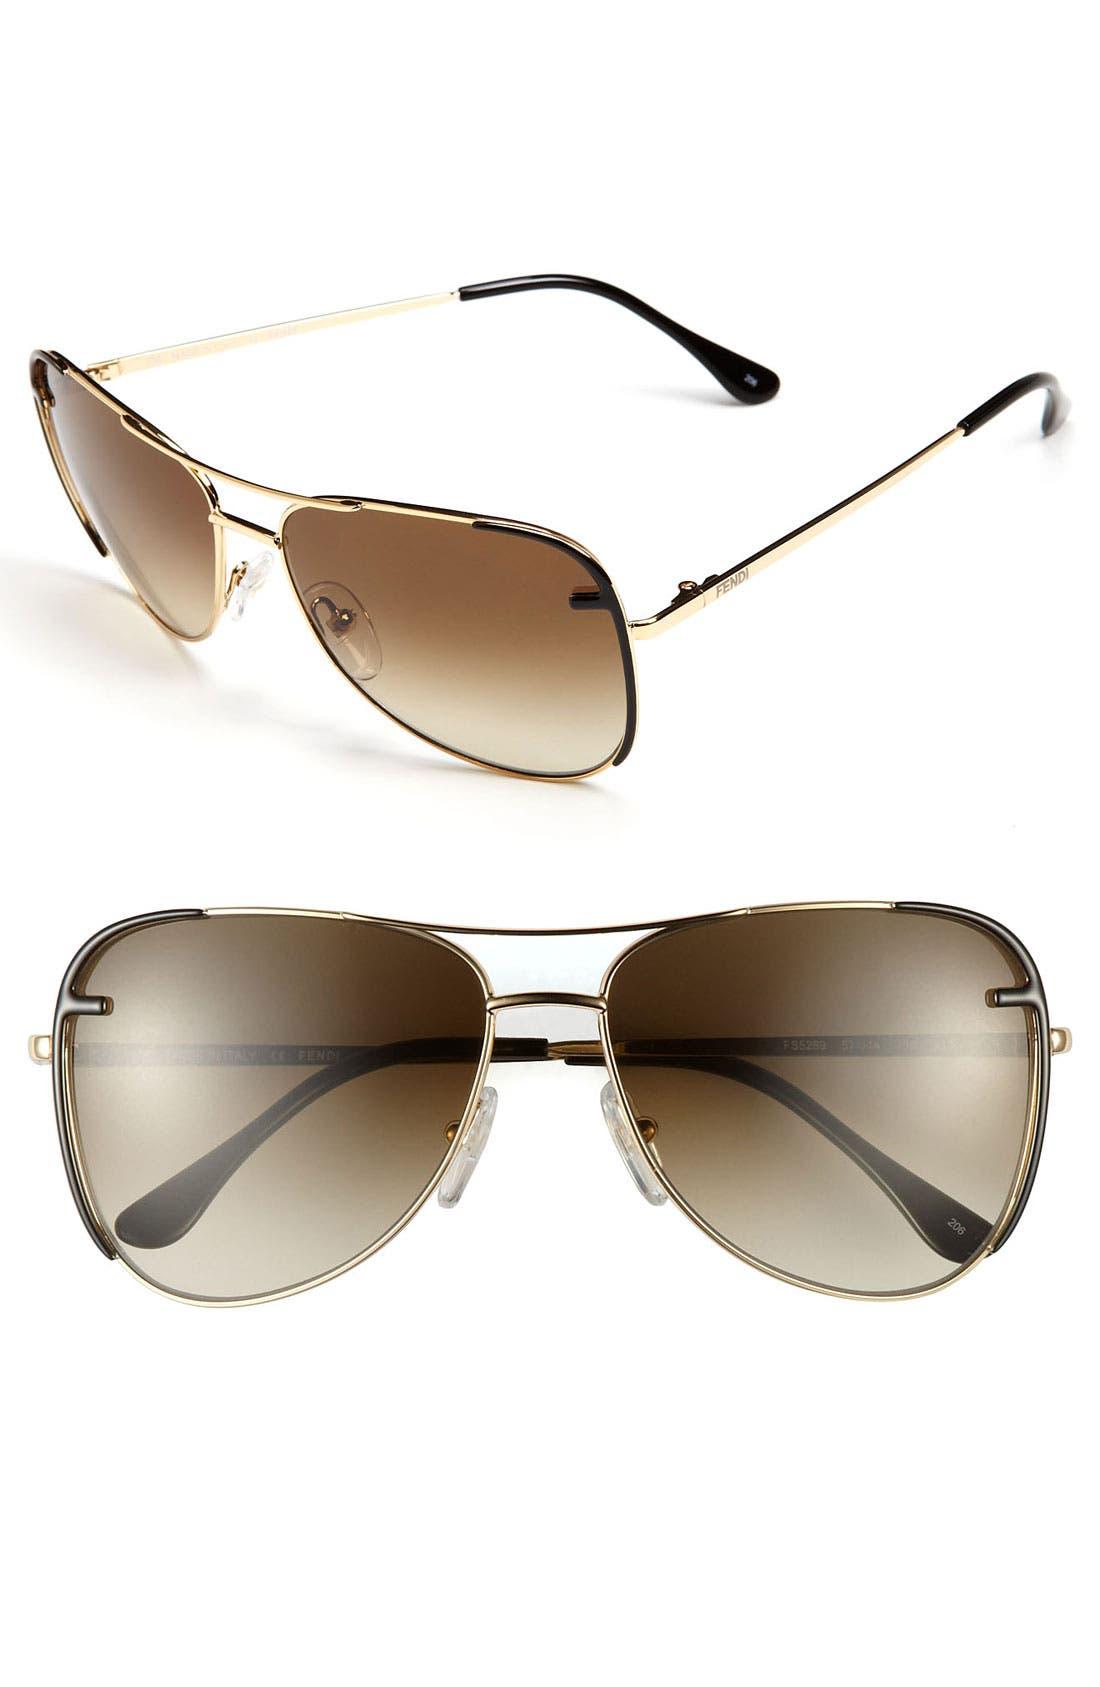 Main Image - Fendi 57mm Metal Aviator Sunglasses